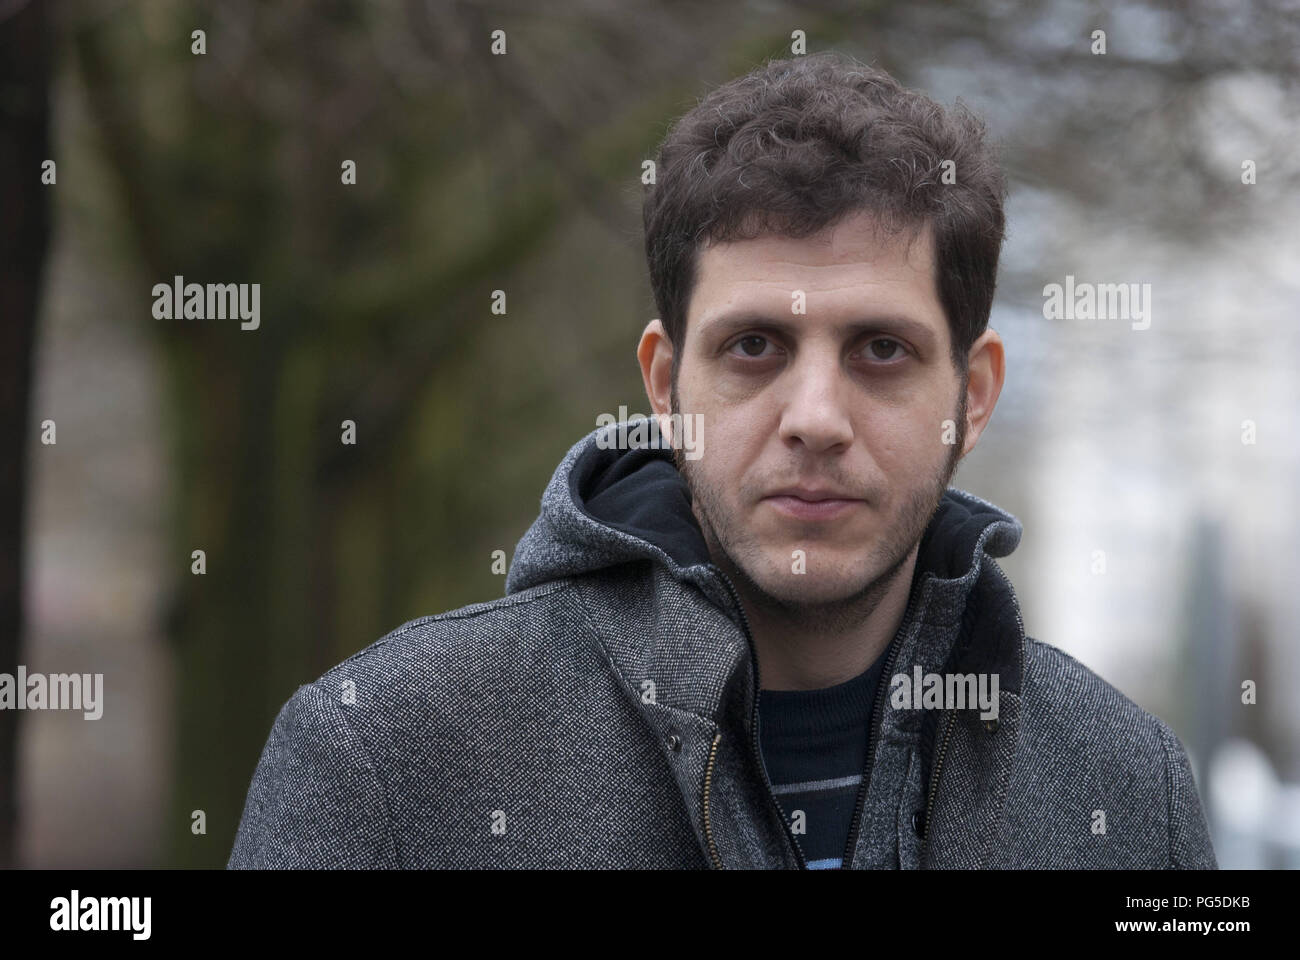 Berlin, DEU, 30.01.2013: Portrait Nir Baram, writer, journalist, author and editor (Israel) - Stock Image